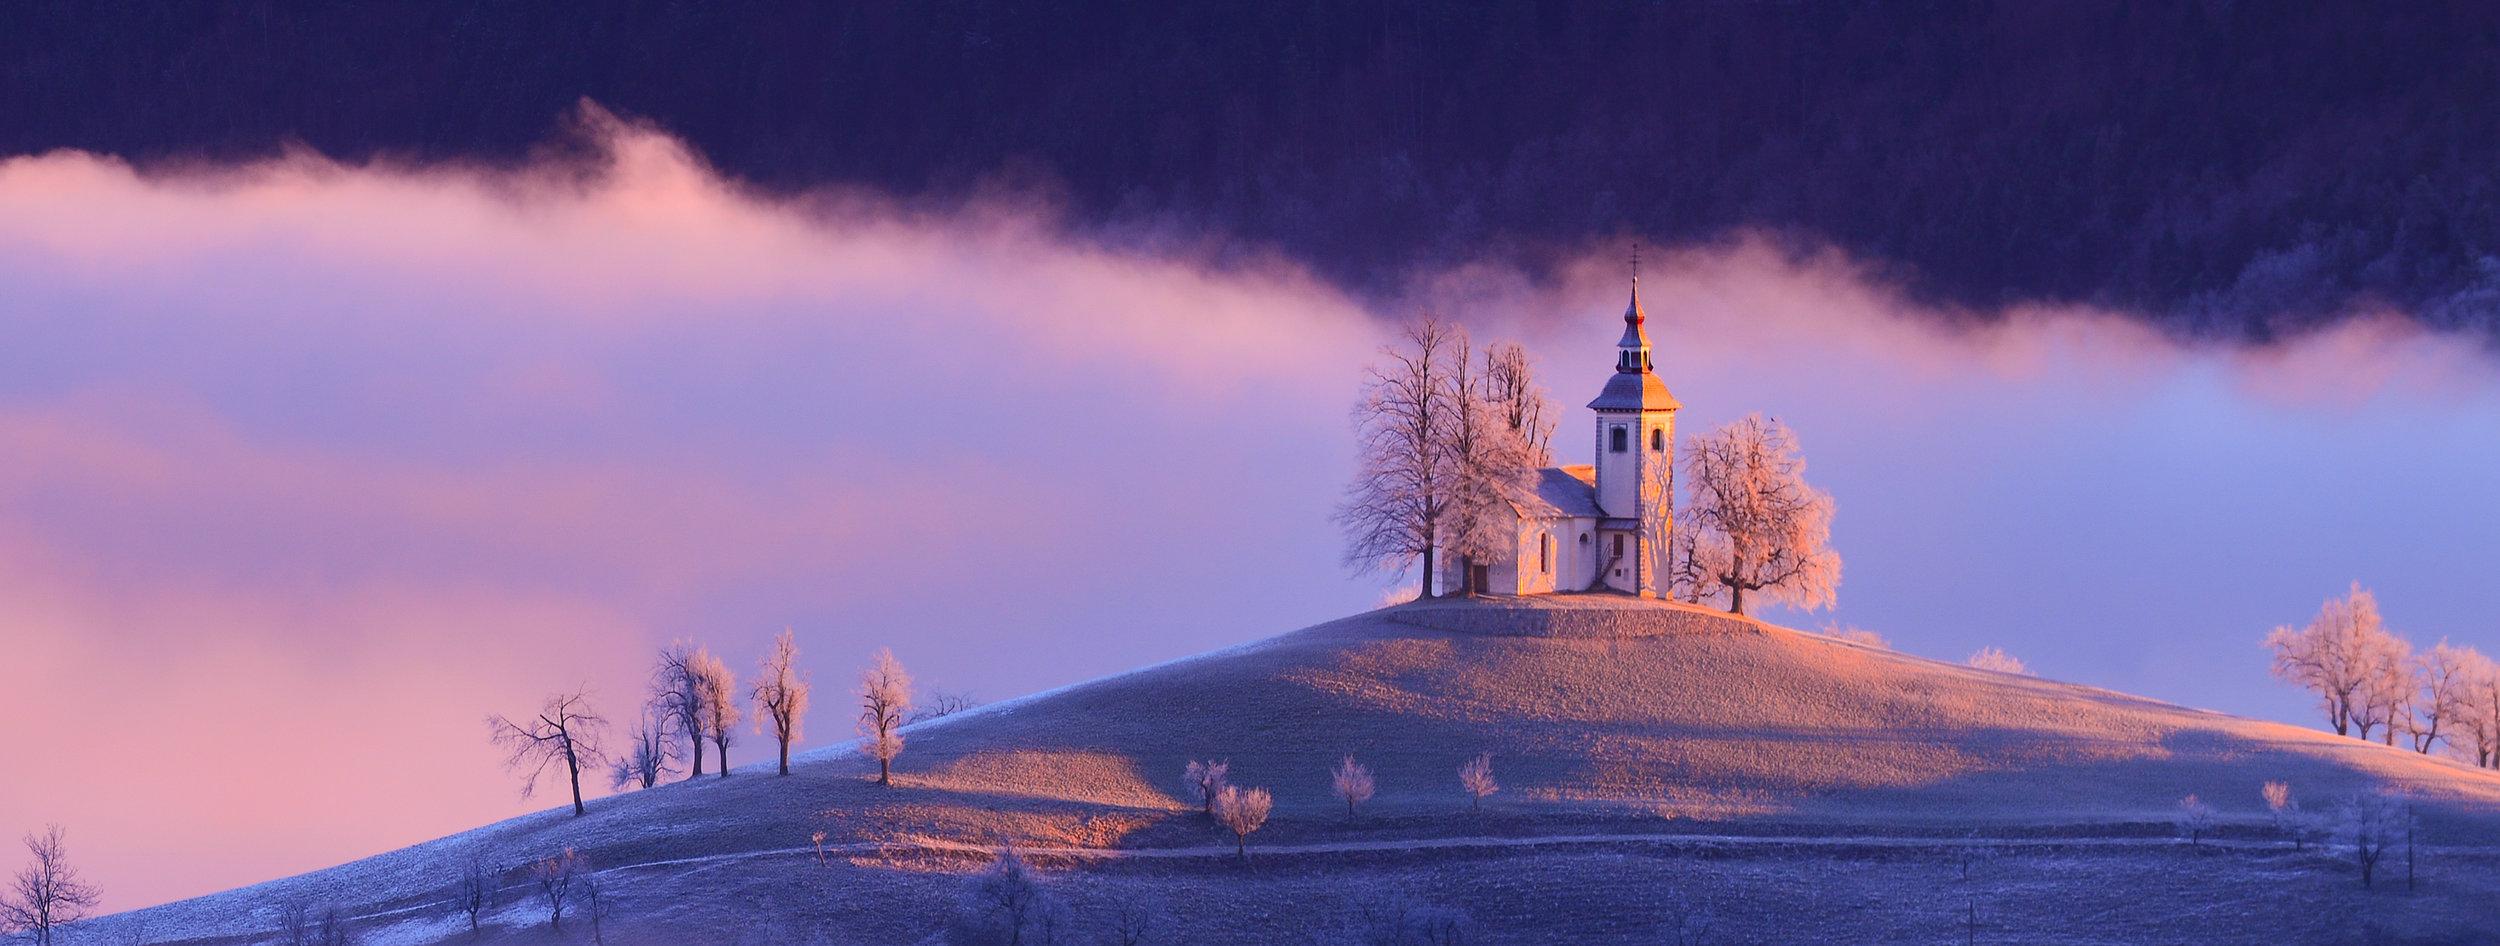 Cold Morning Rising